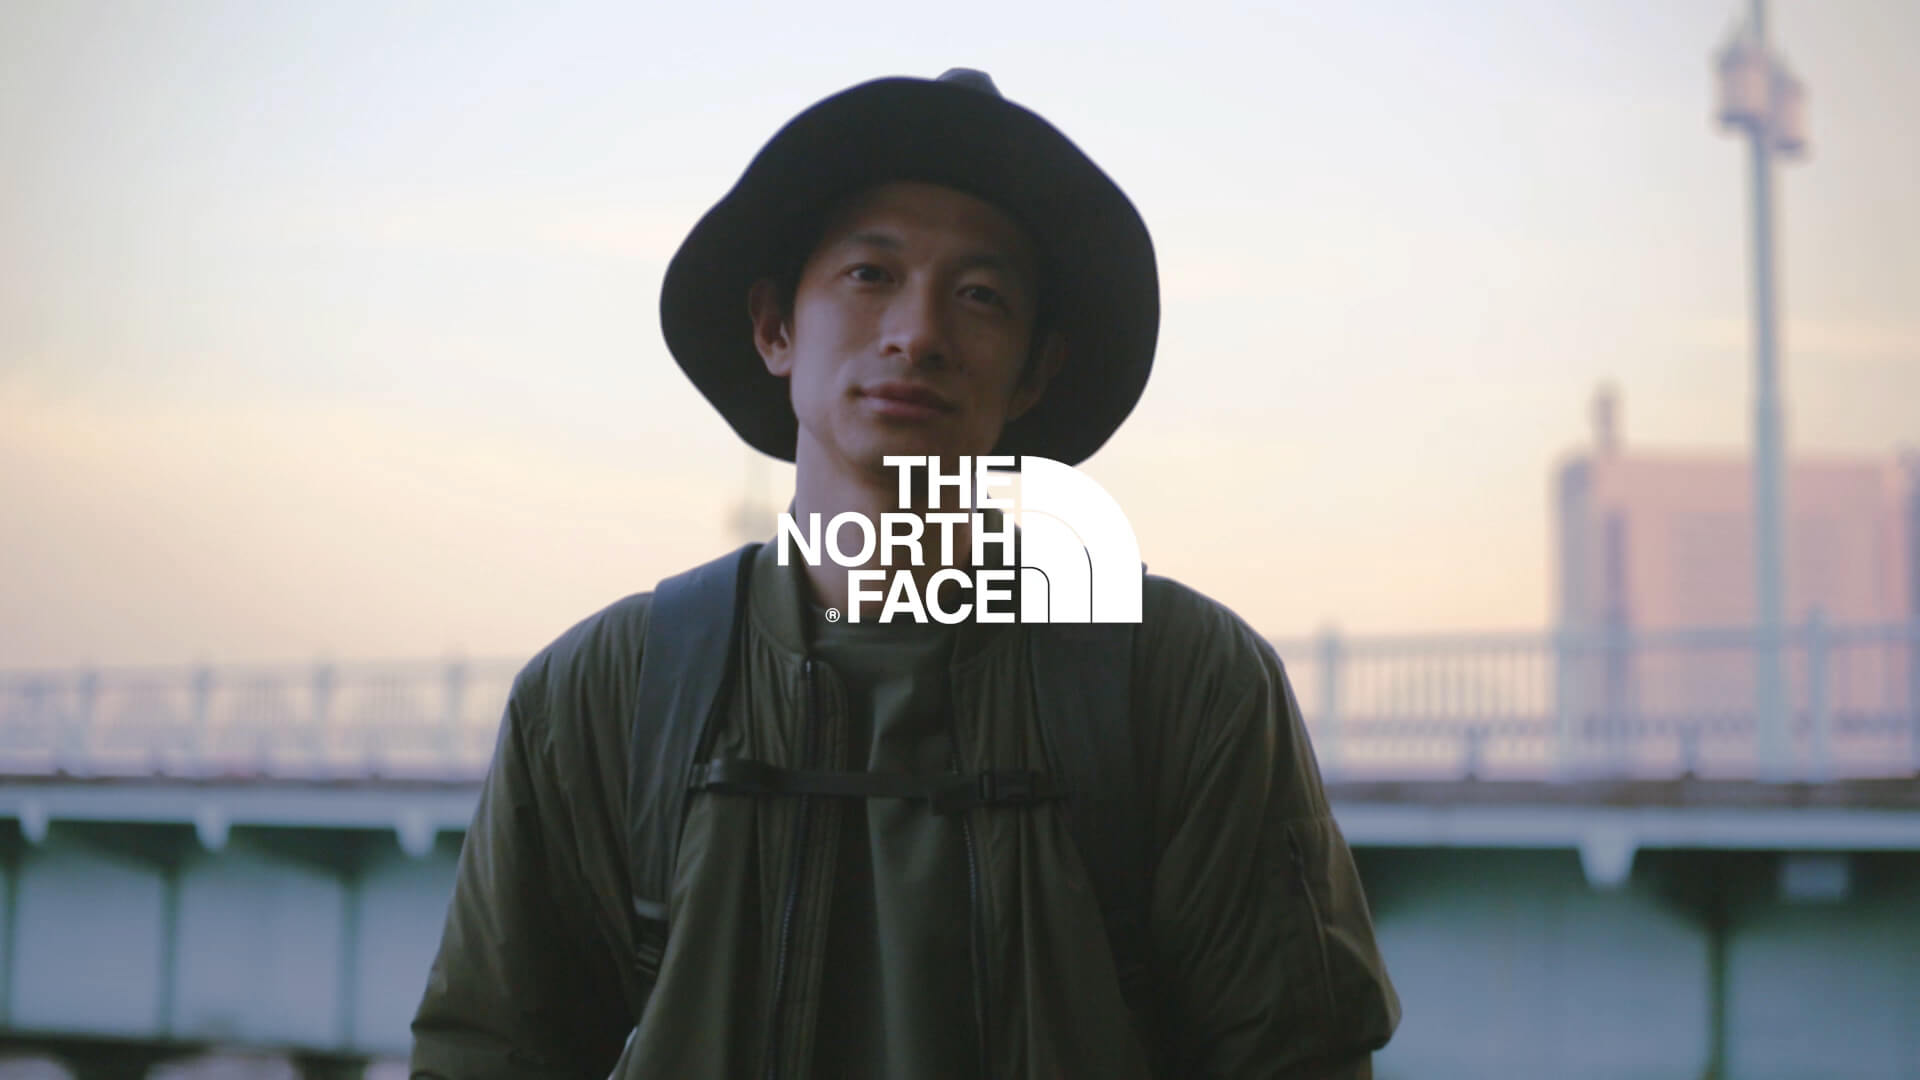 180814_northface_FINAL_H264-(0-00-01-12)